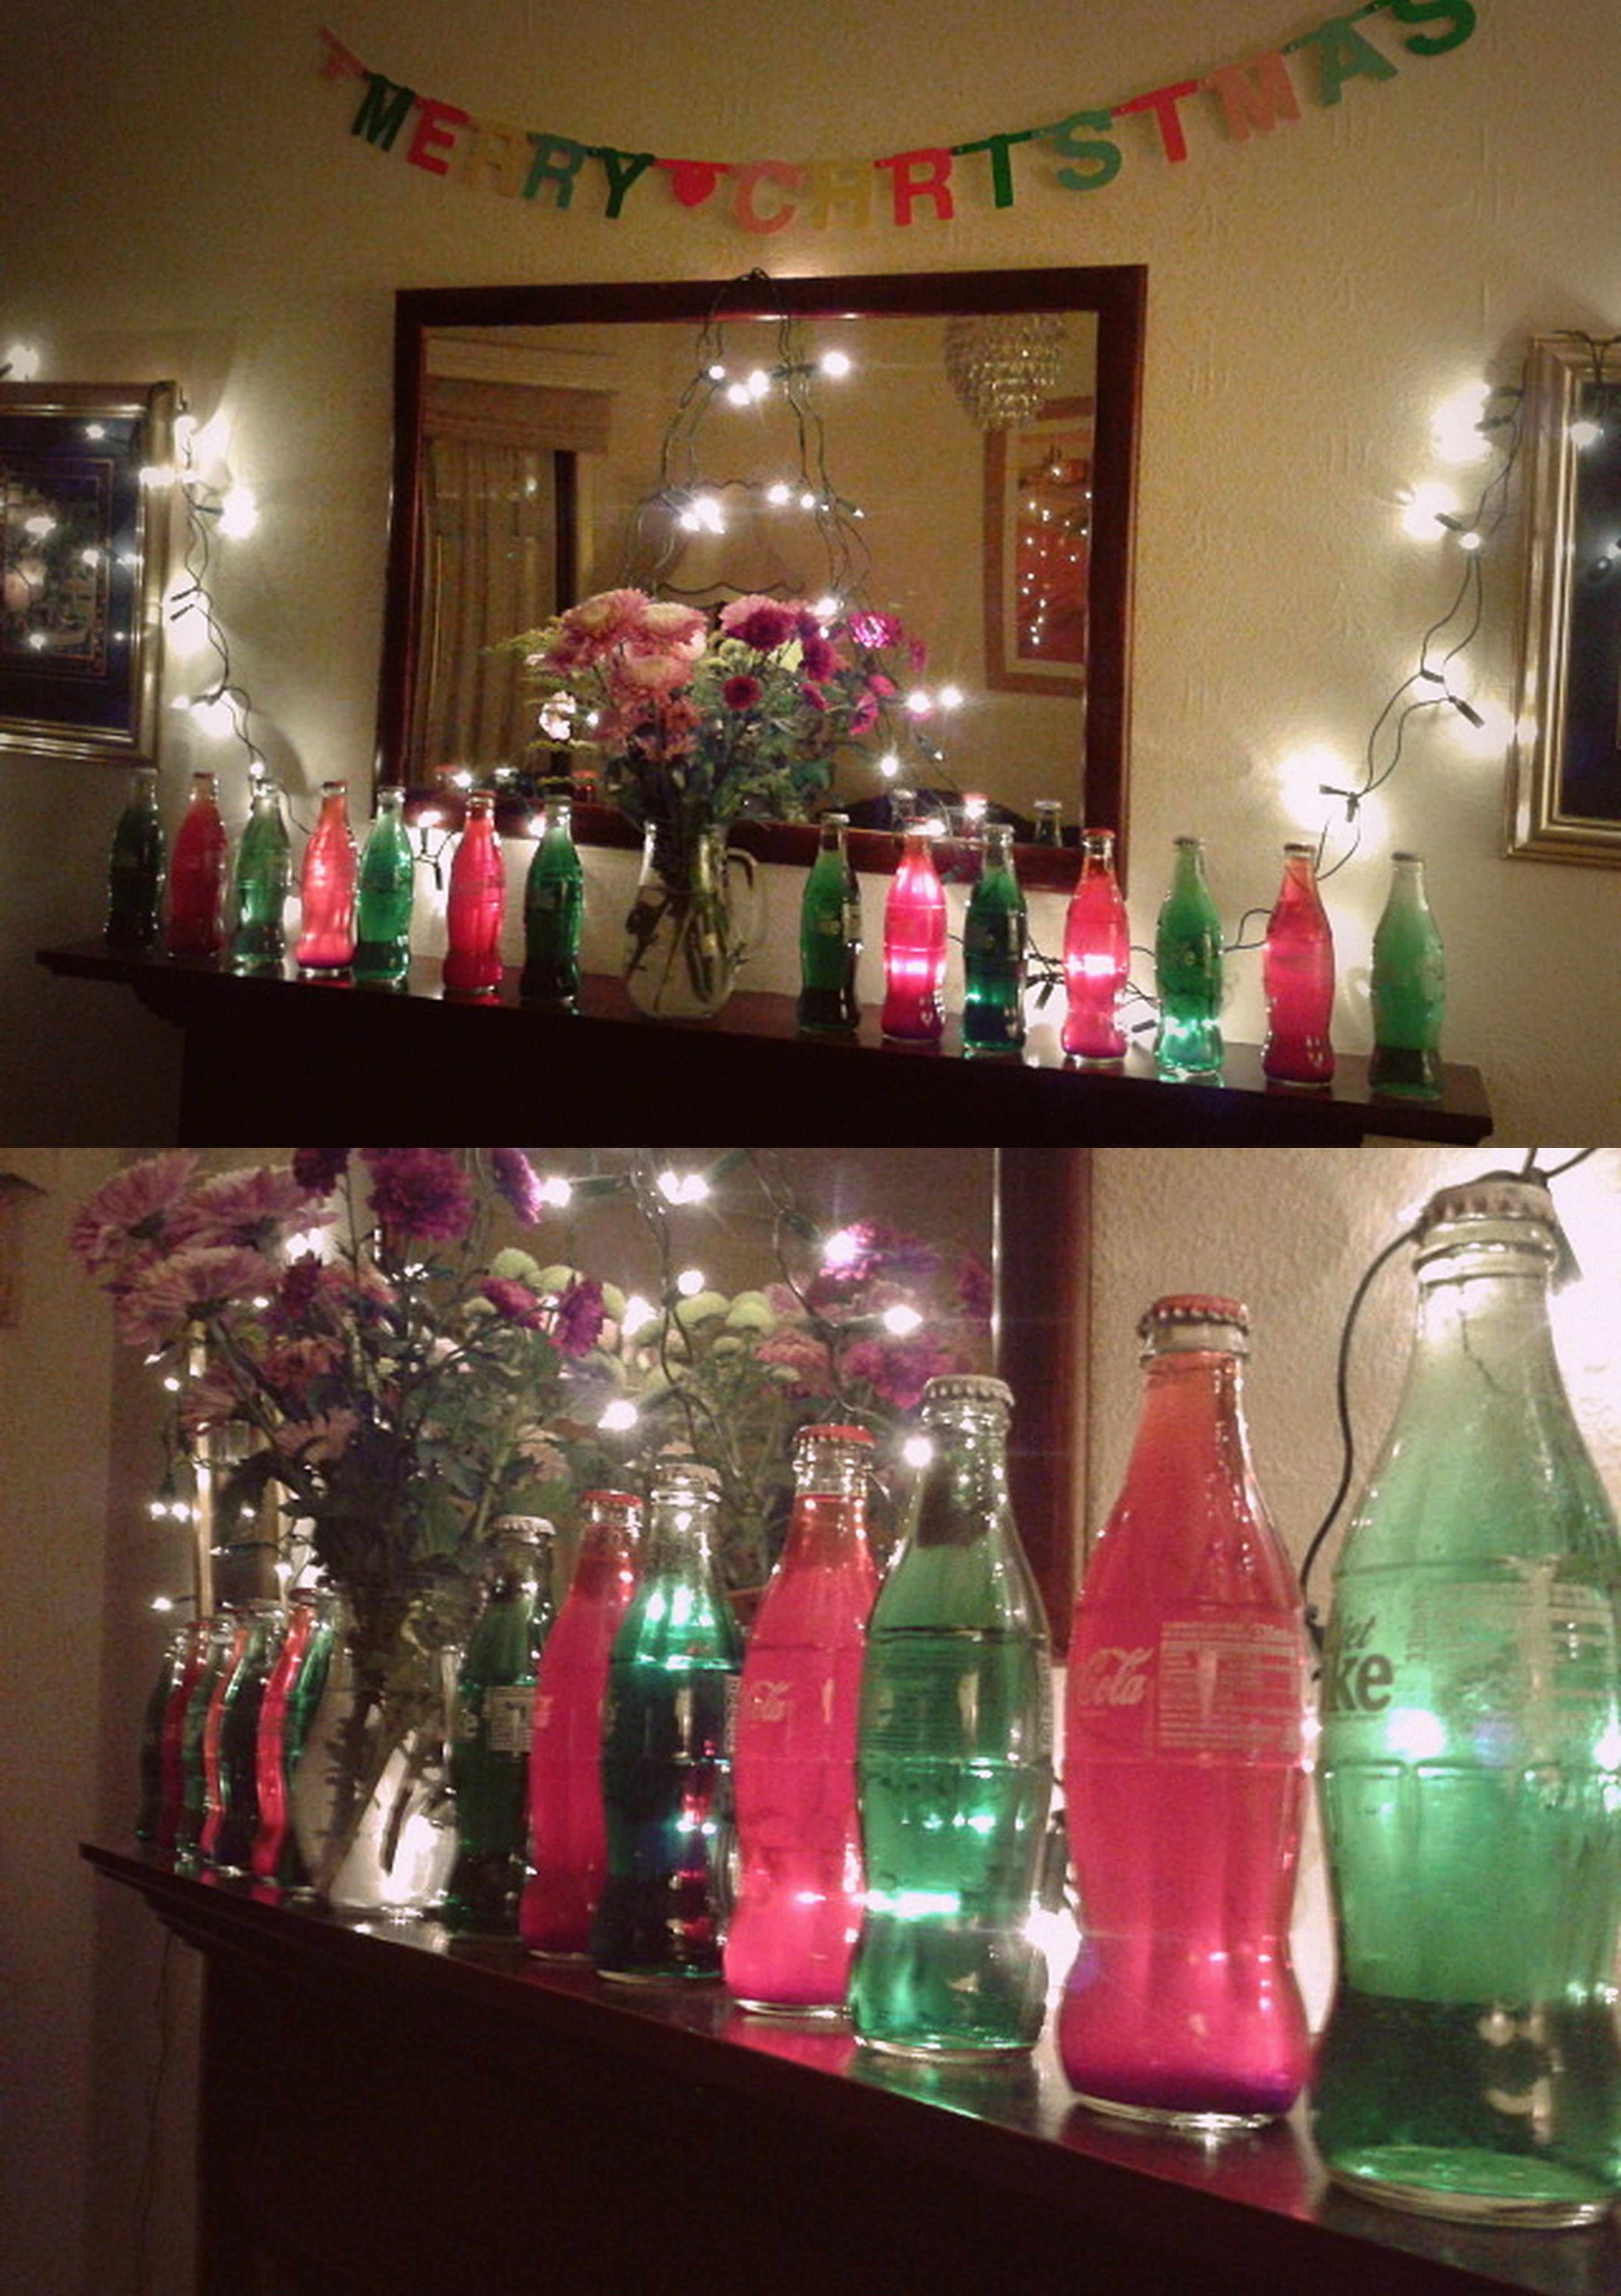 Bottle Christmas Decoration Diy Coke Bottle Christmas Decorations  Fill A Coke Bottle With A